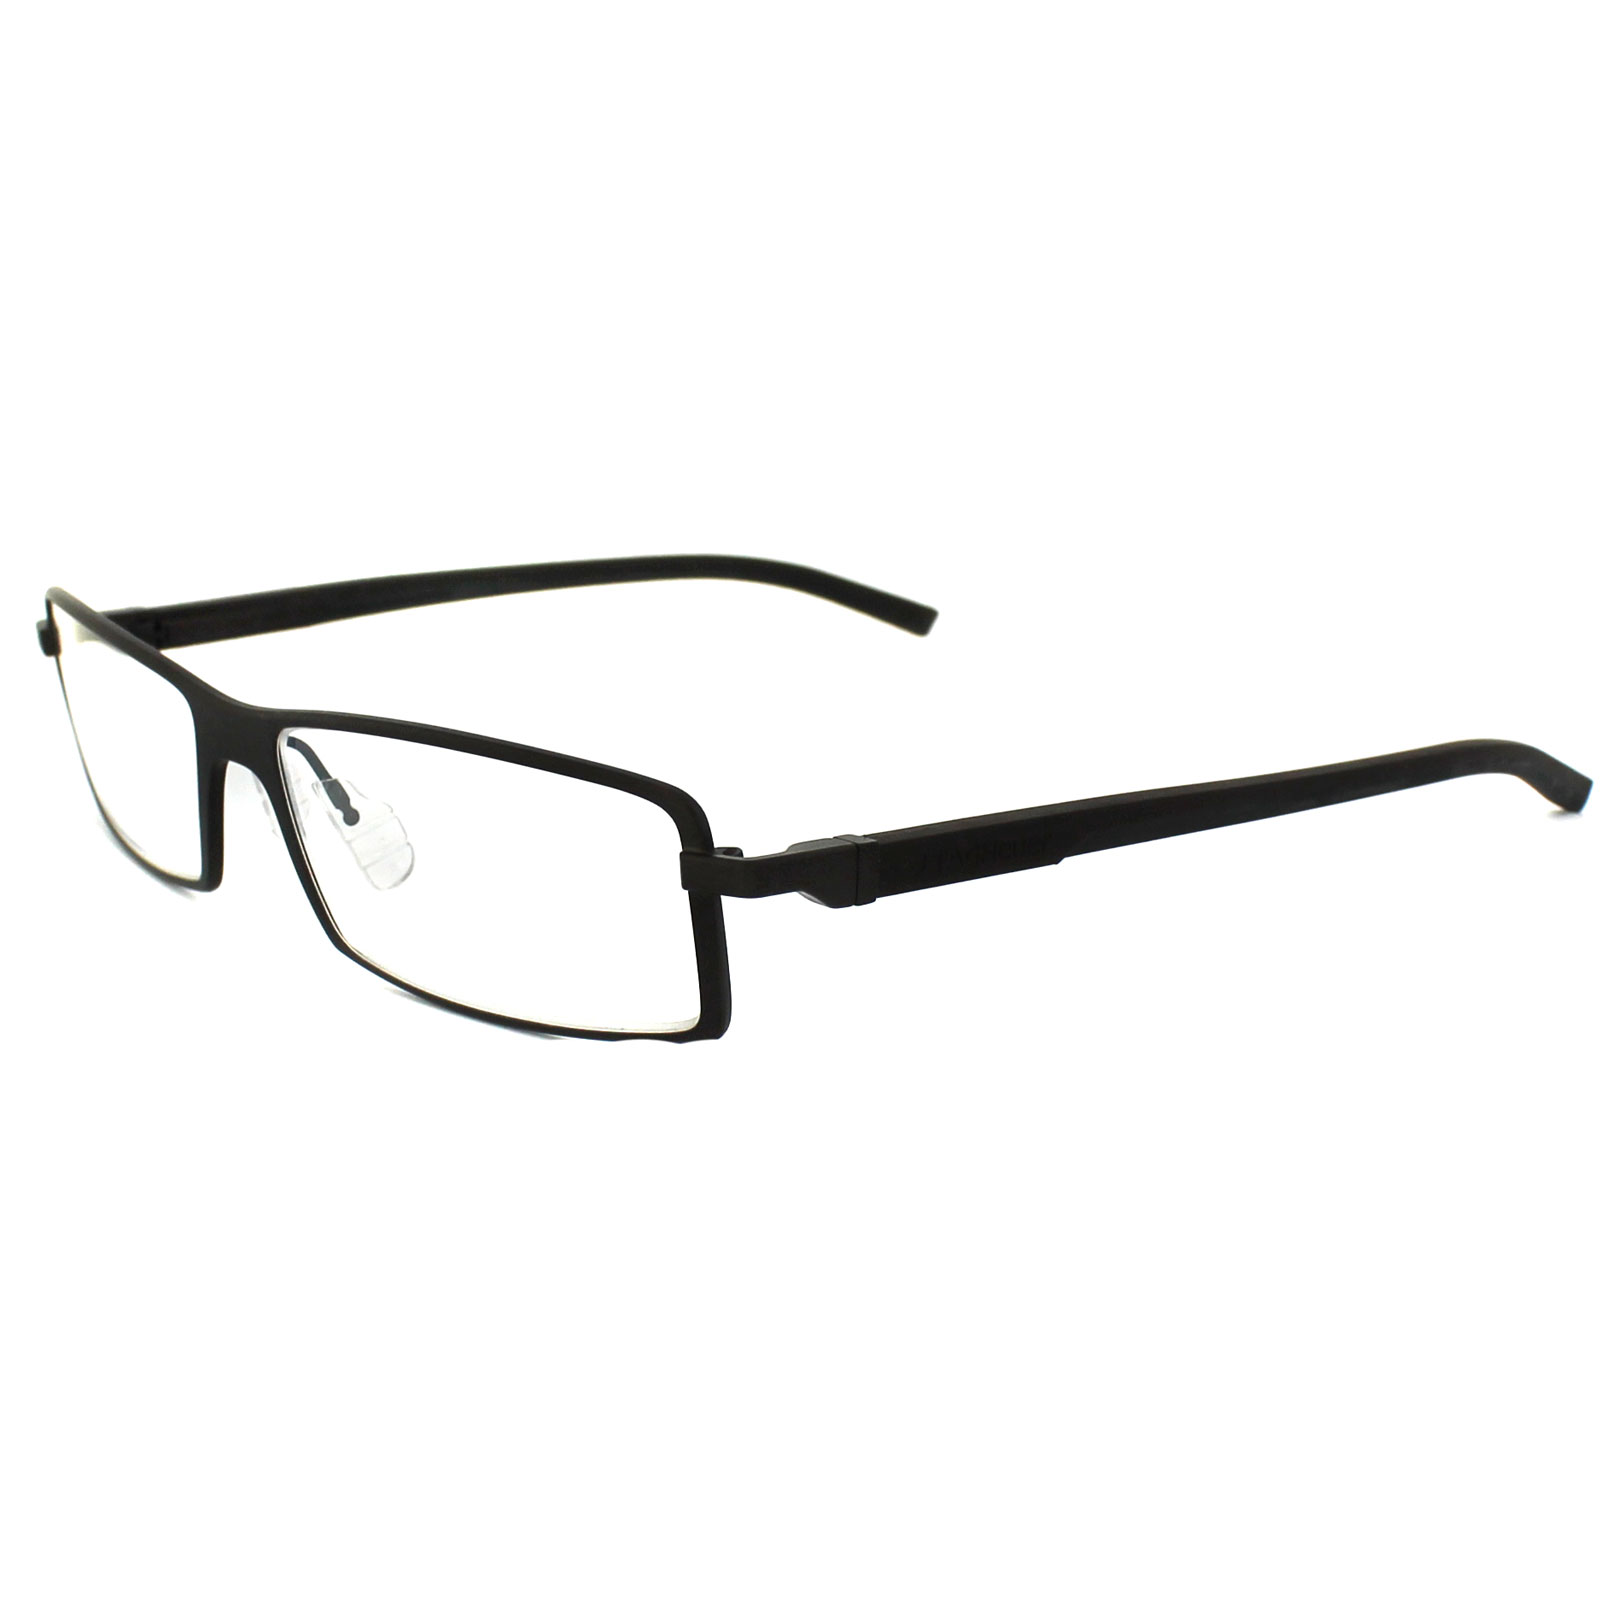 c4d40693e35 Sentinel Tag Heuer Glasses Frames Automatic 0802 003 Matt Chocolate